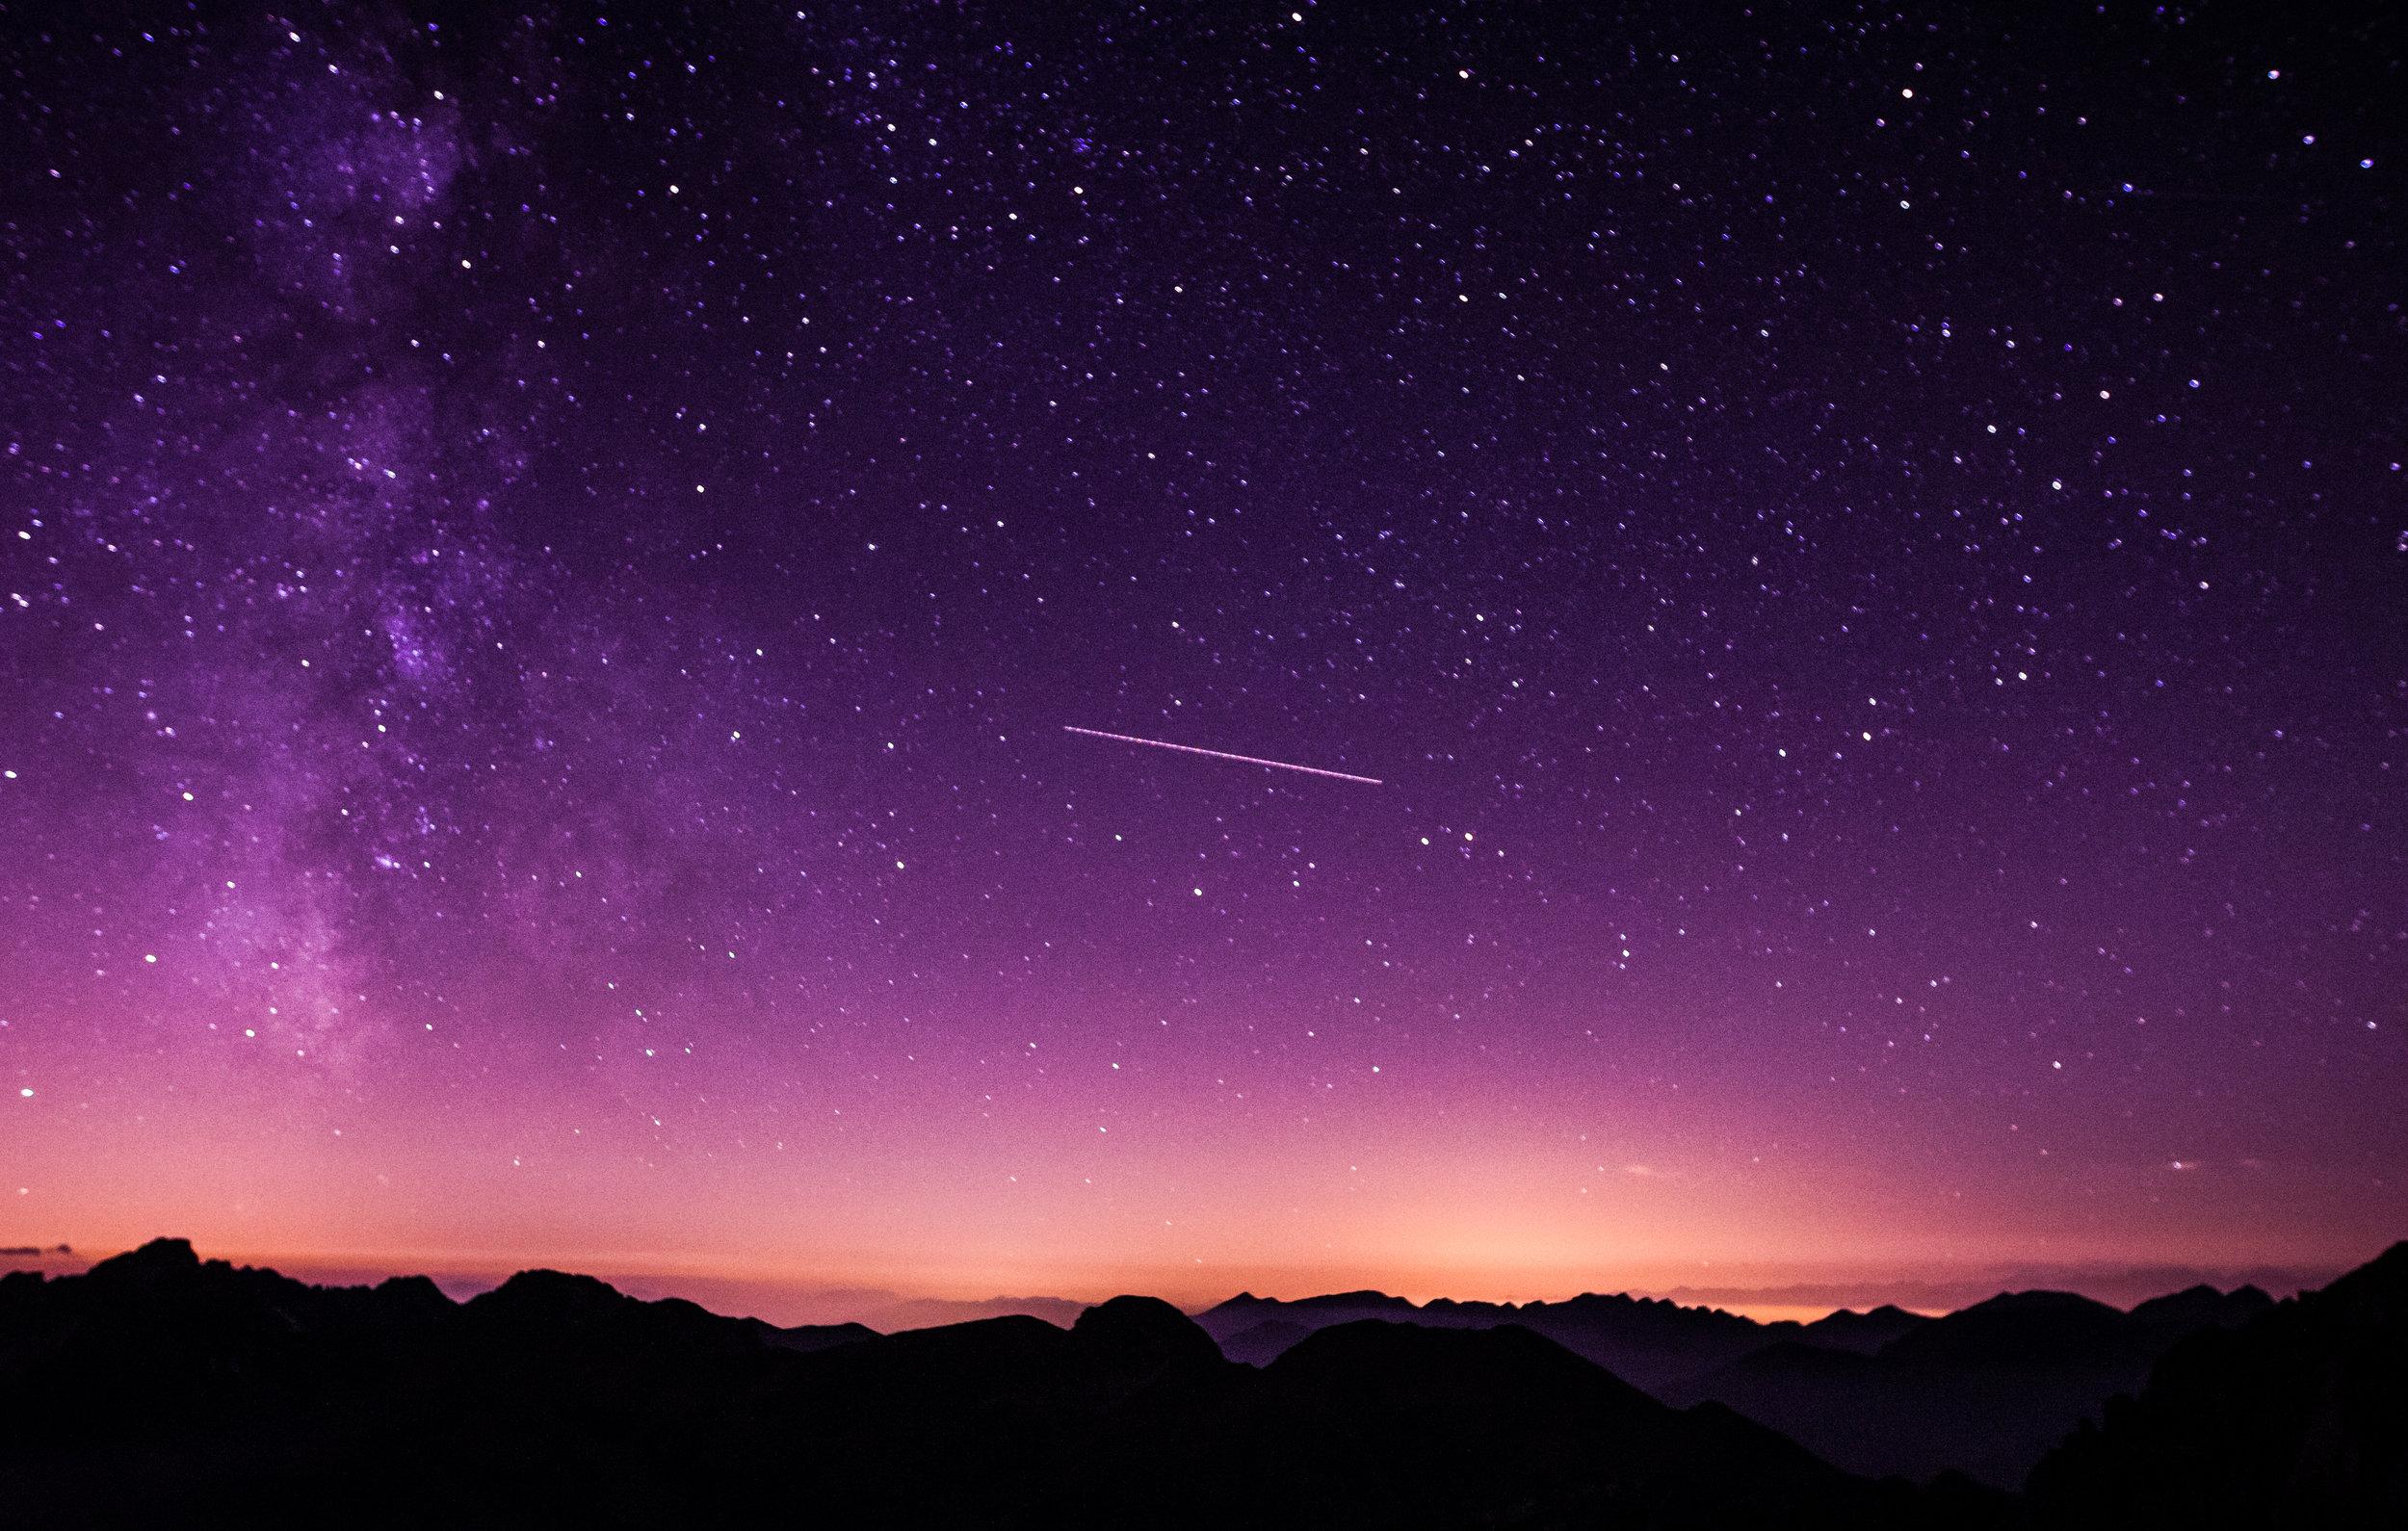 A meteor crossing a starry night sky